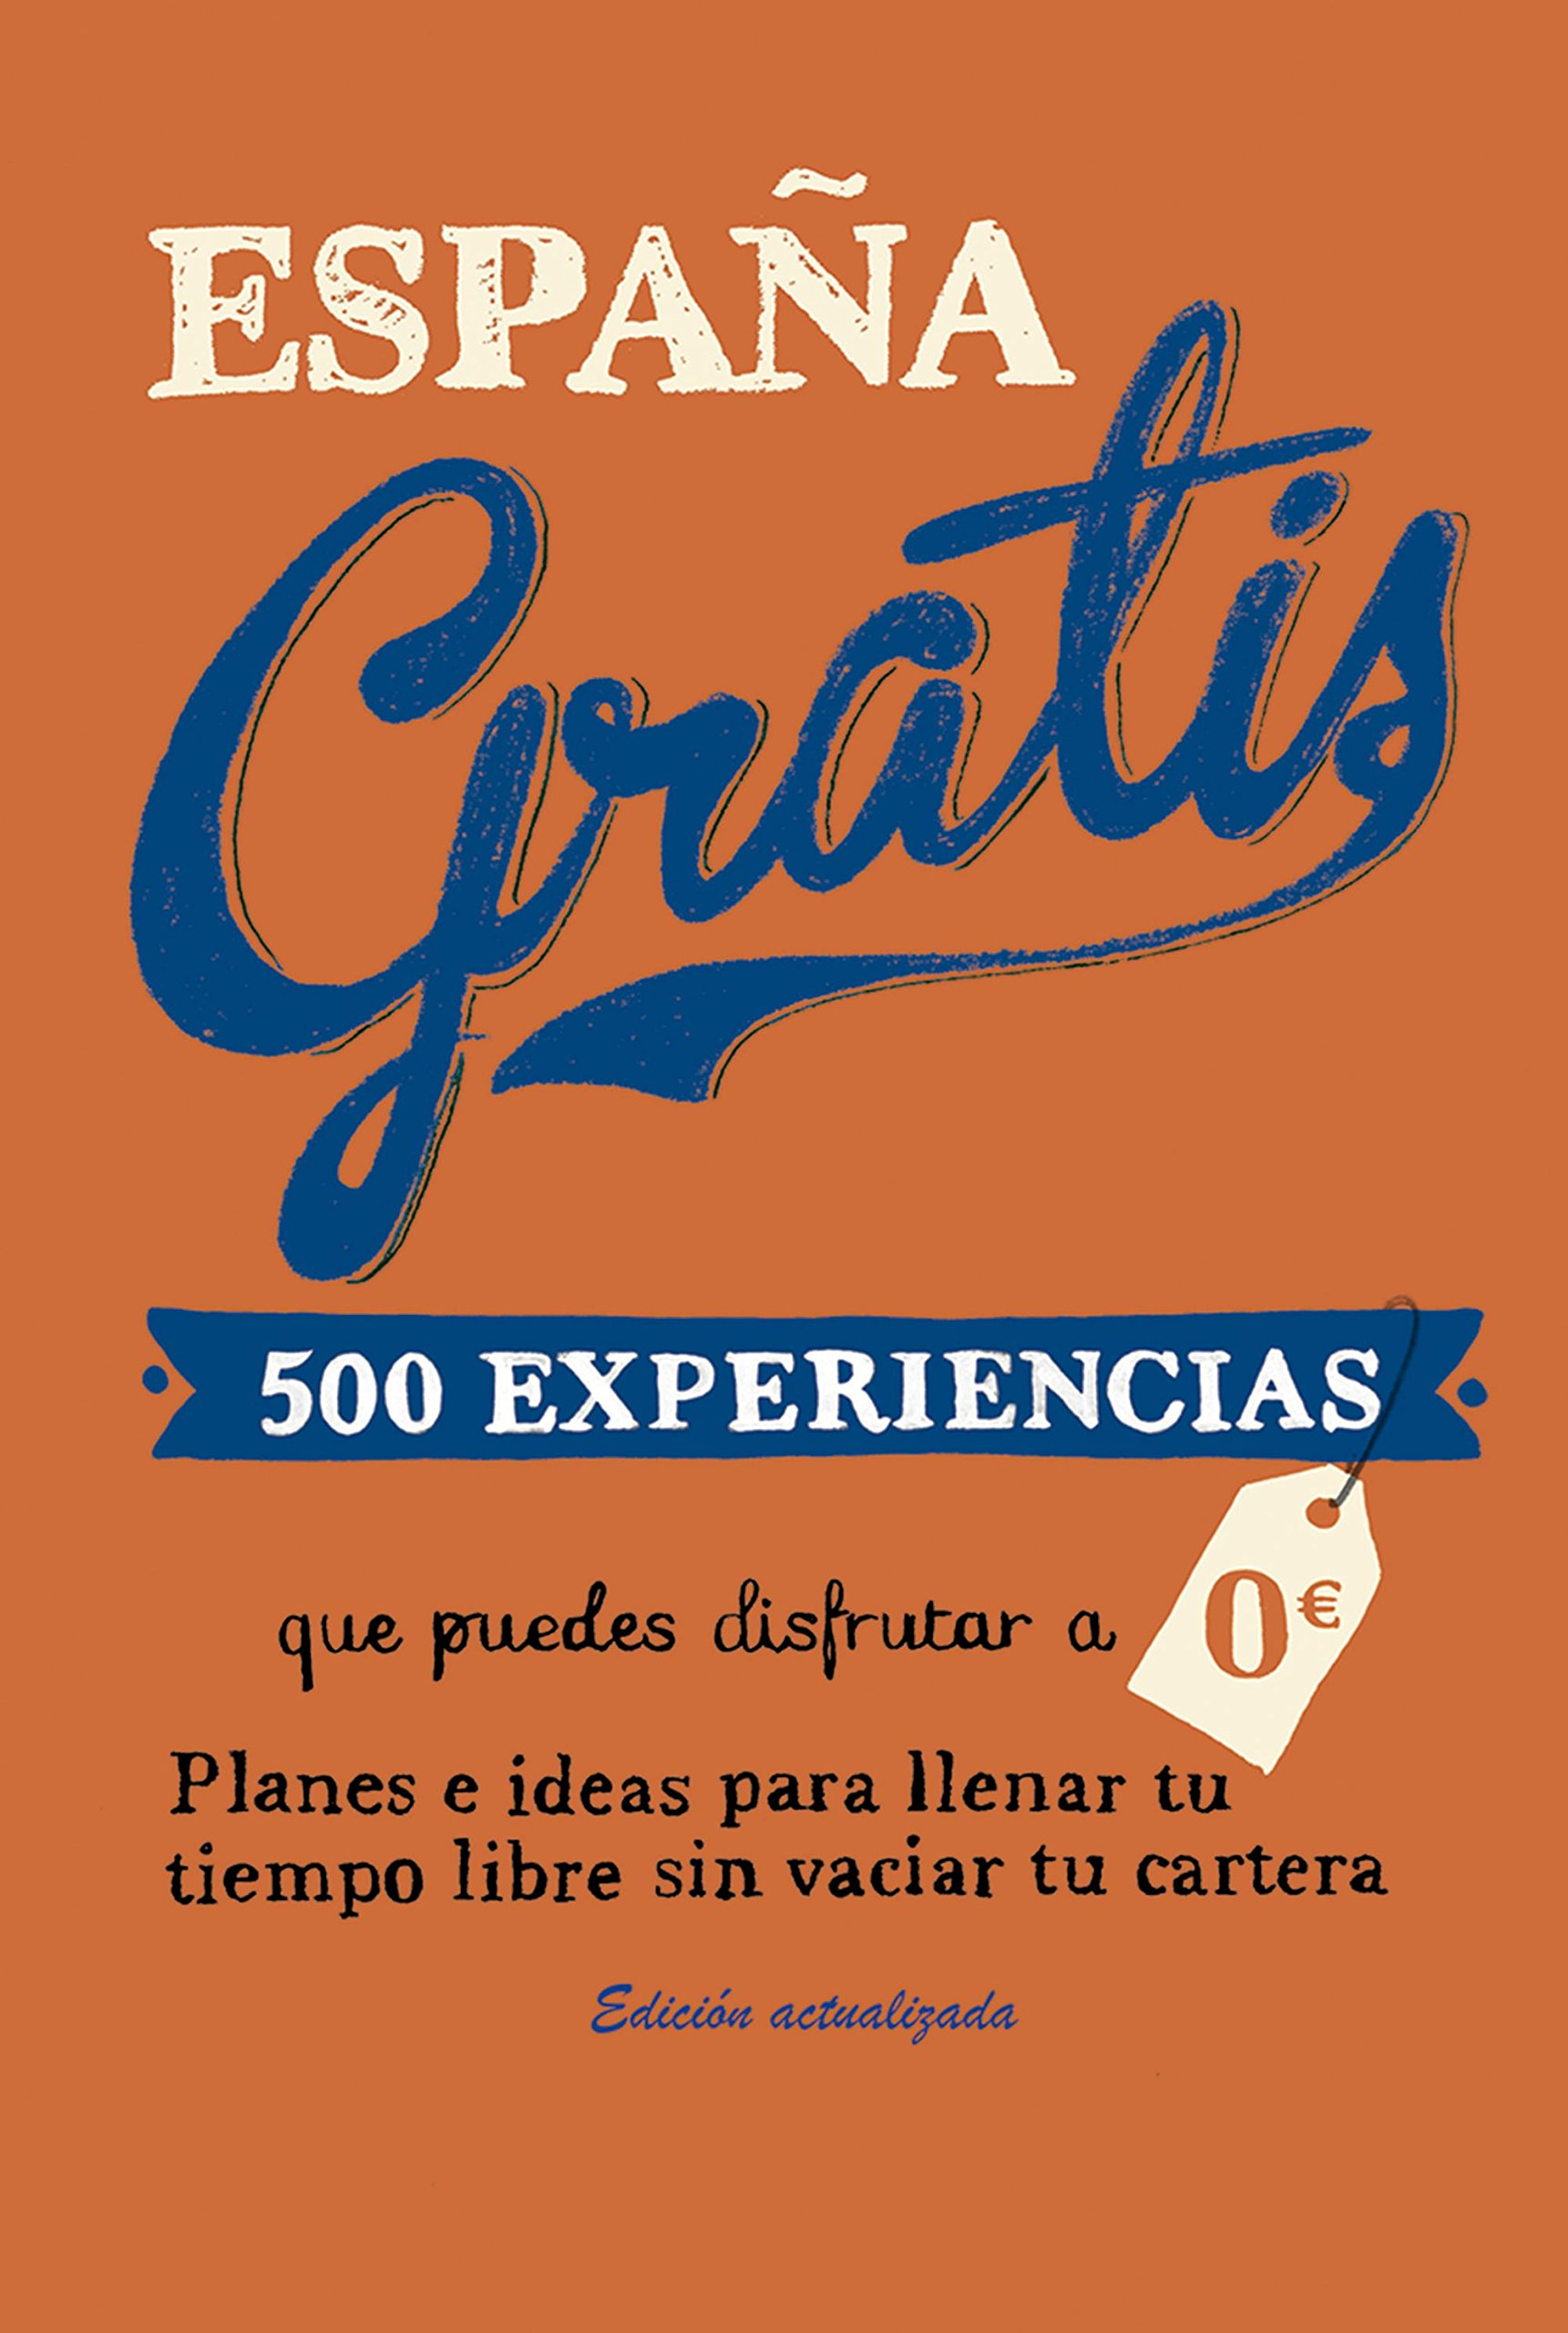 España gratis: 500 Experiencias que puedes disfrutar a 0 euros ...